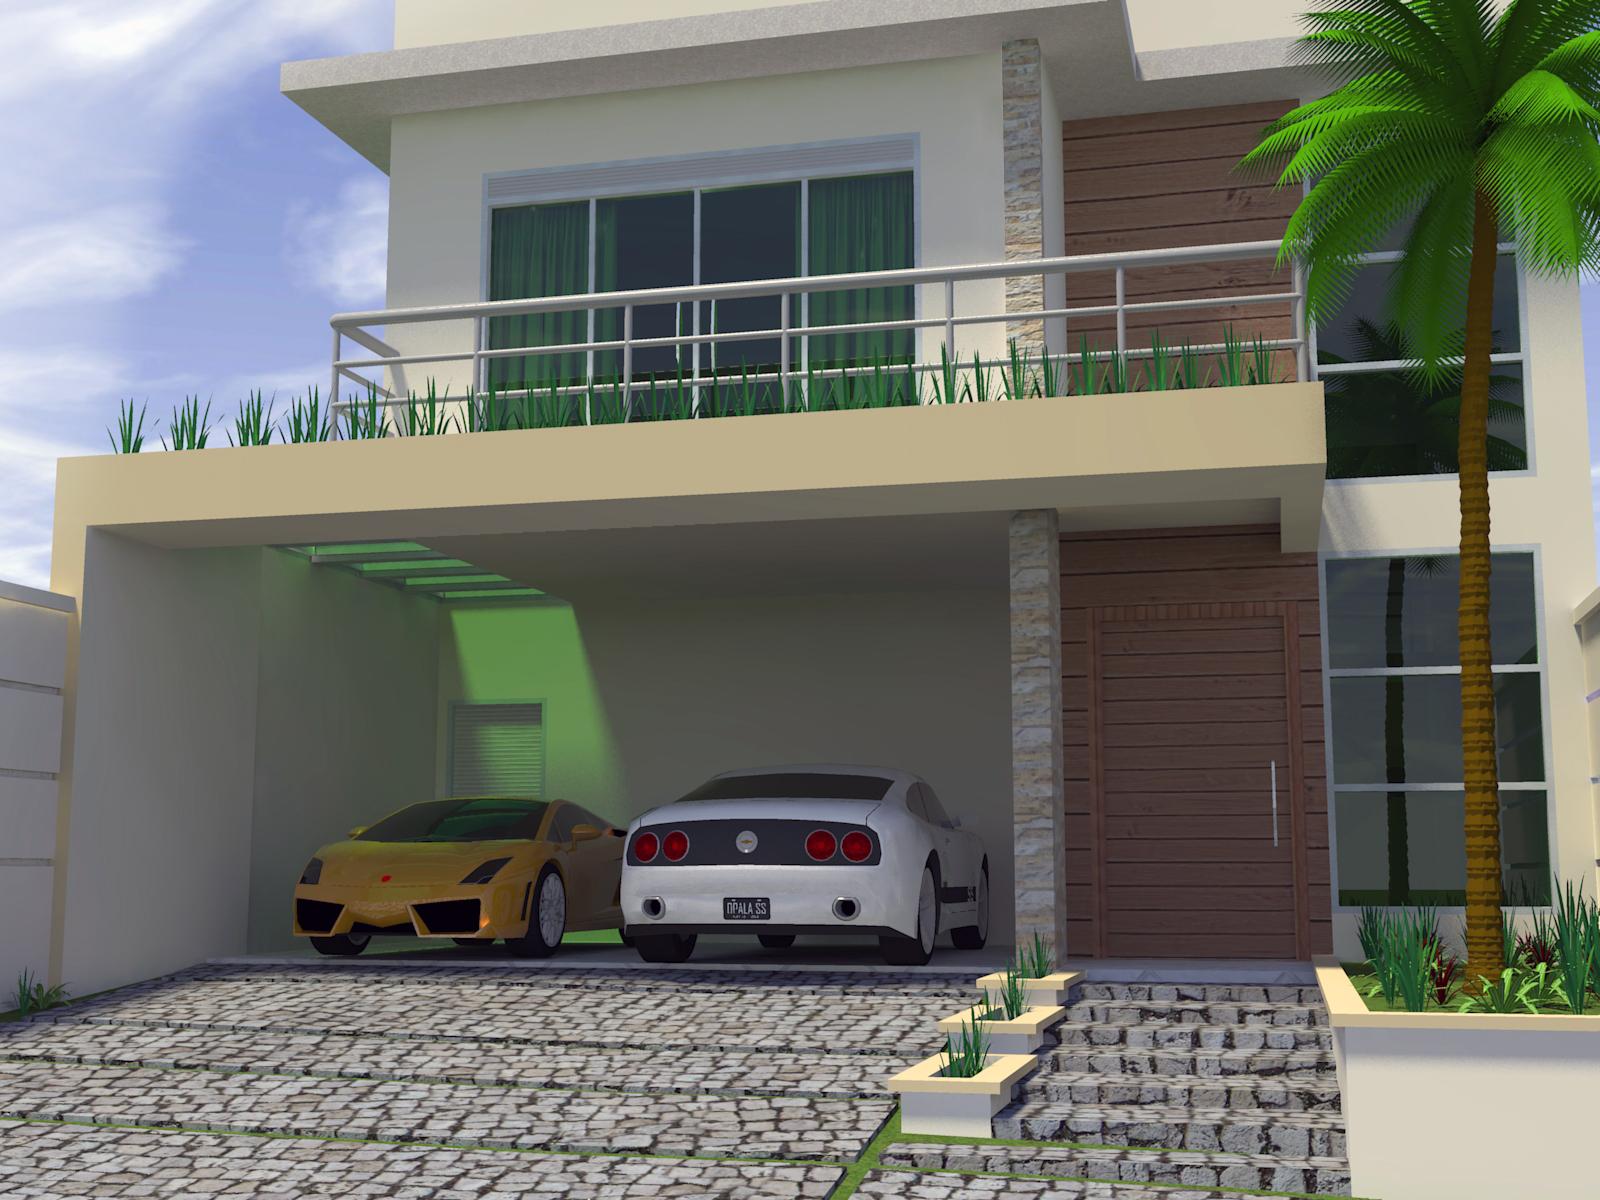 Casas modernas x casas neocl ssicas for Casa moderna 11